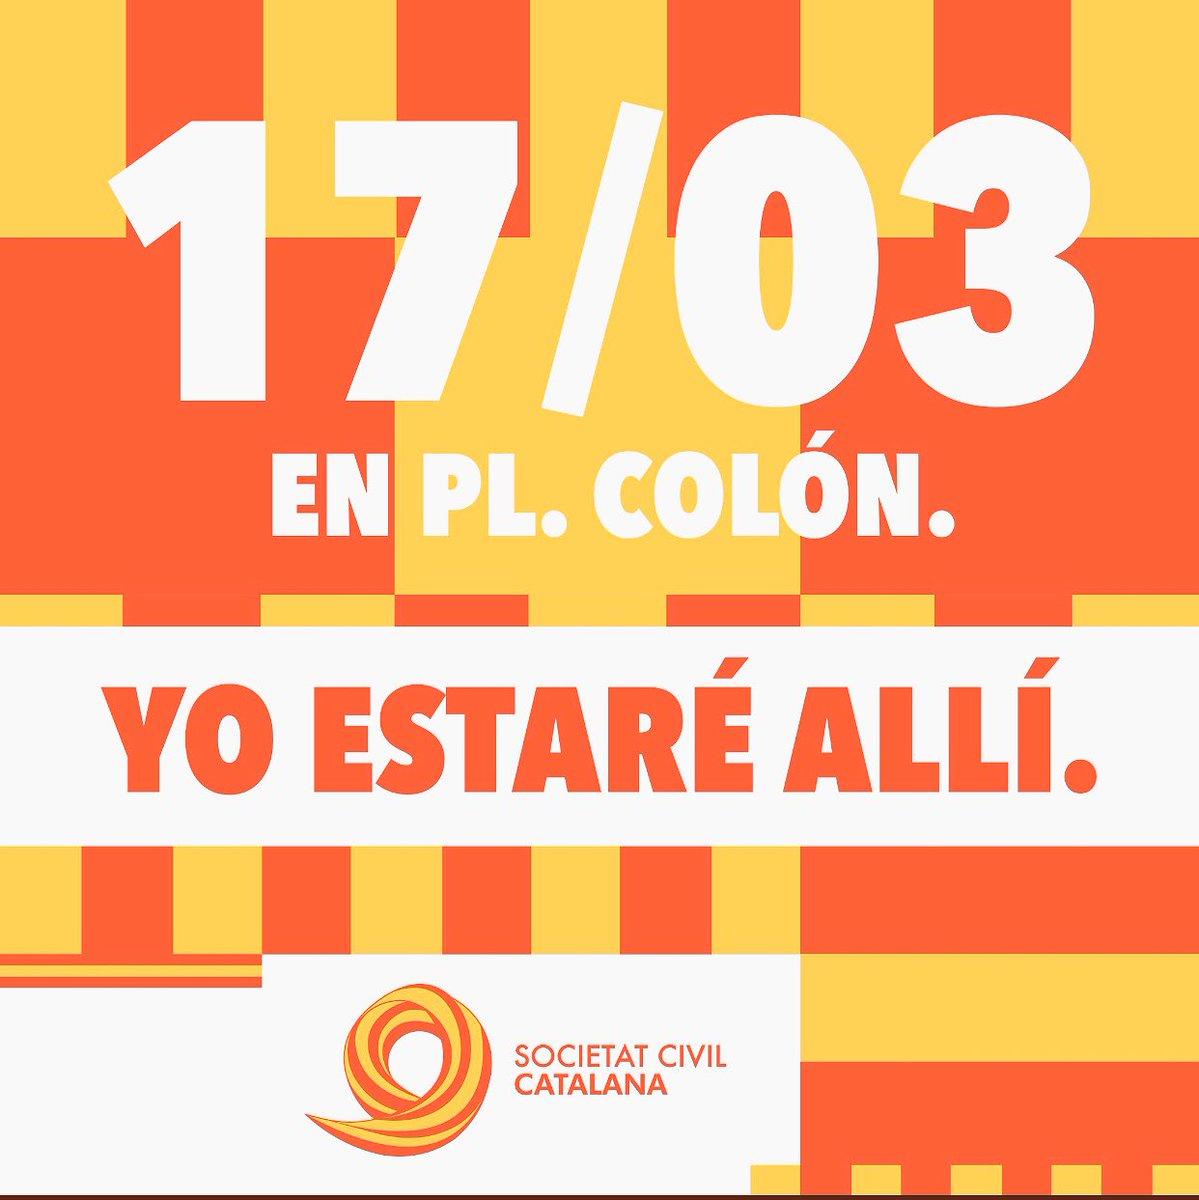 ¿Sociedad Civil Catalana enMadrid? Por Antonio Jaumandreu@Ajaumandreu